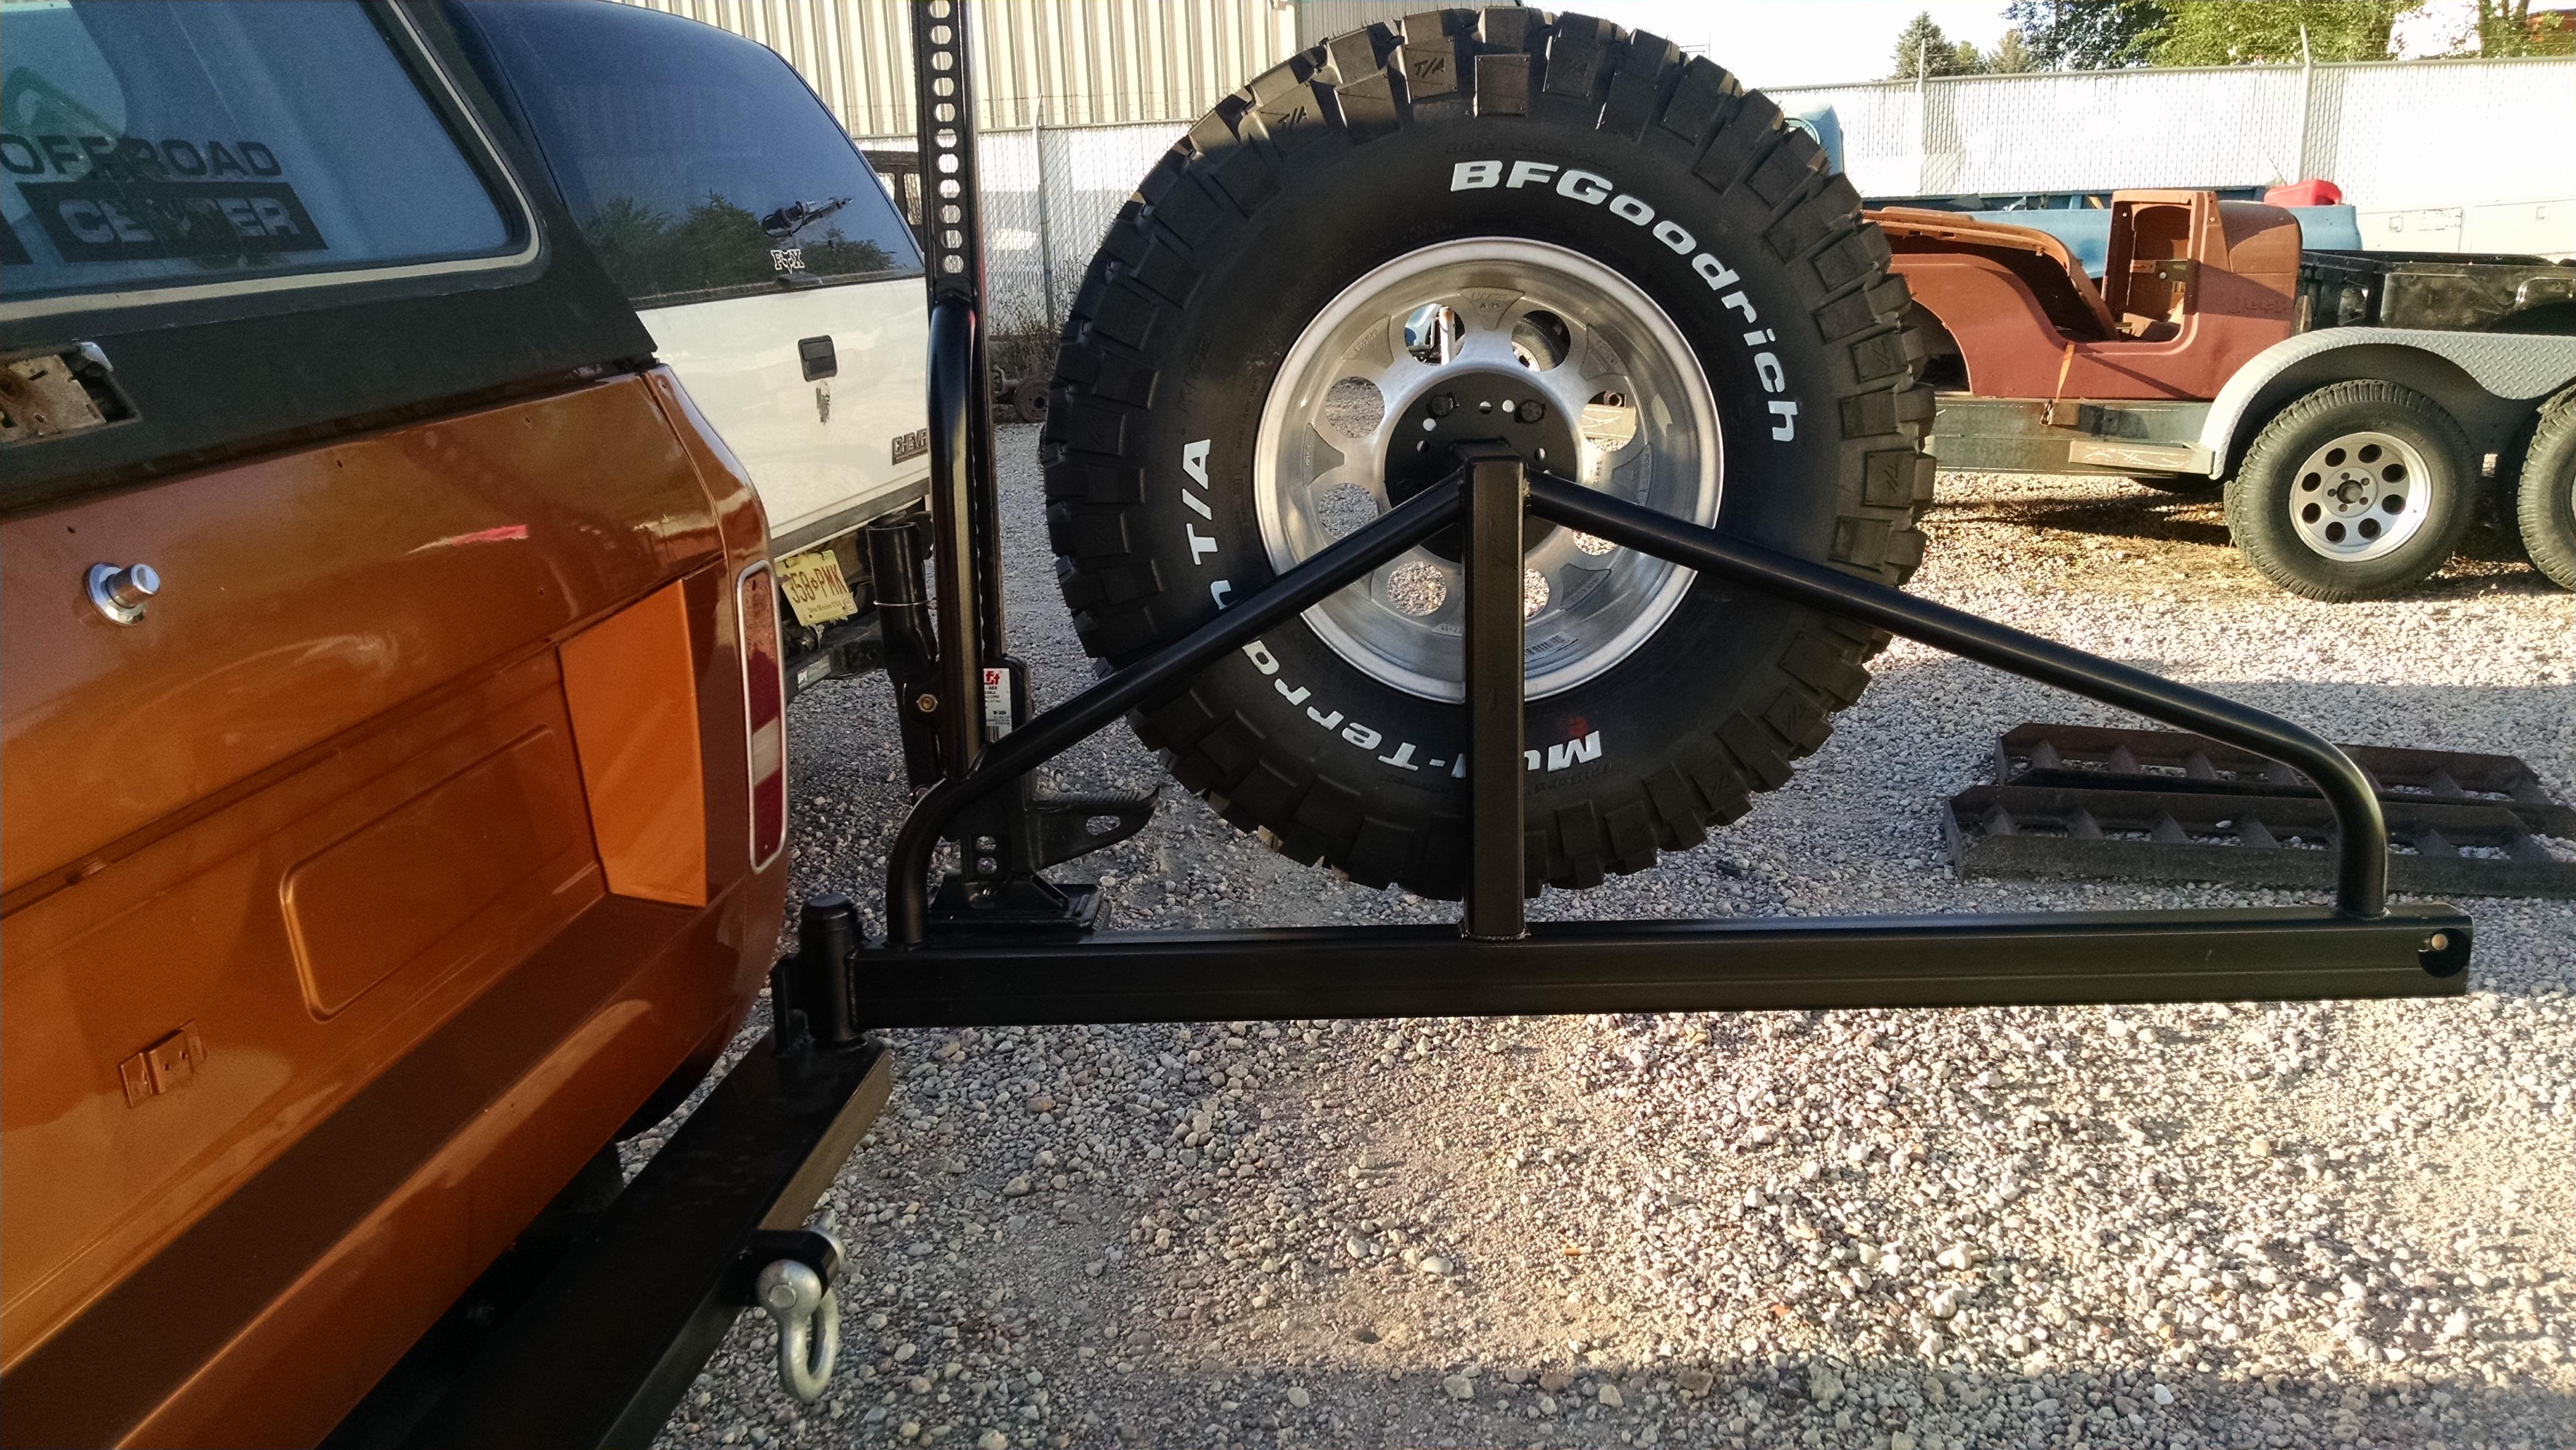 Daystar Kj Bk Giant furthermore Jeep Tj Wrangler Full Length Torque Box Floor Support Drivers Side additionally Lv Cologneinstall furthermore Jeep Cj Yj Grille Mount Cj Cj Cj Cj Scrambler W For Sale in addition Std. on jeep cj5 body mount kit